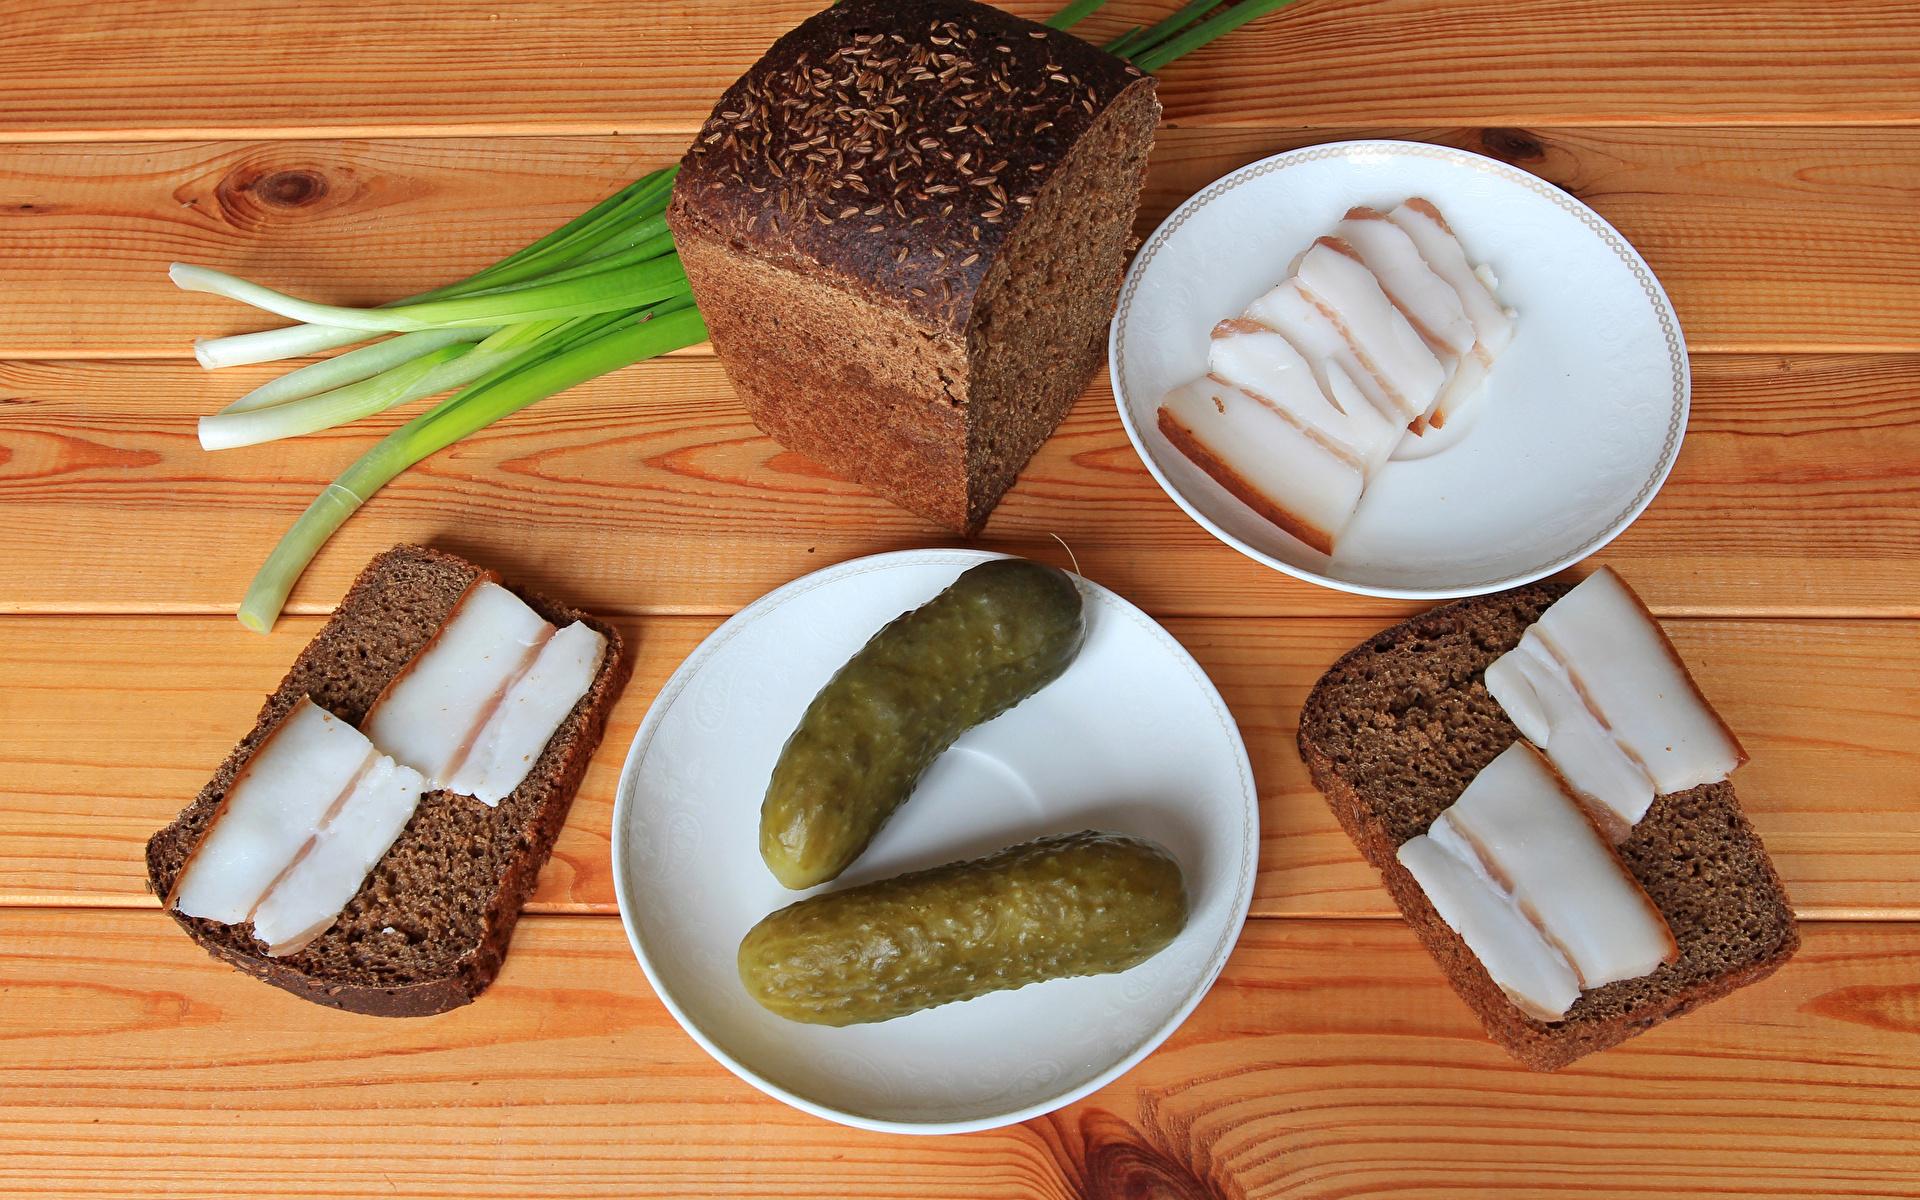 Wallpaper Cucumbers Salo - Food Bread Food Saucer 1920x1200